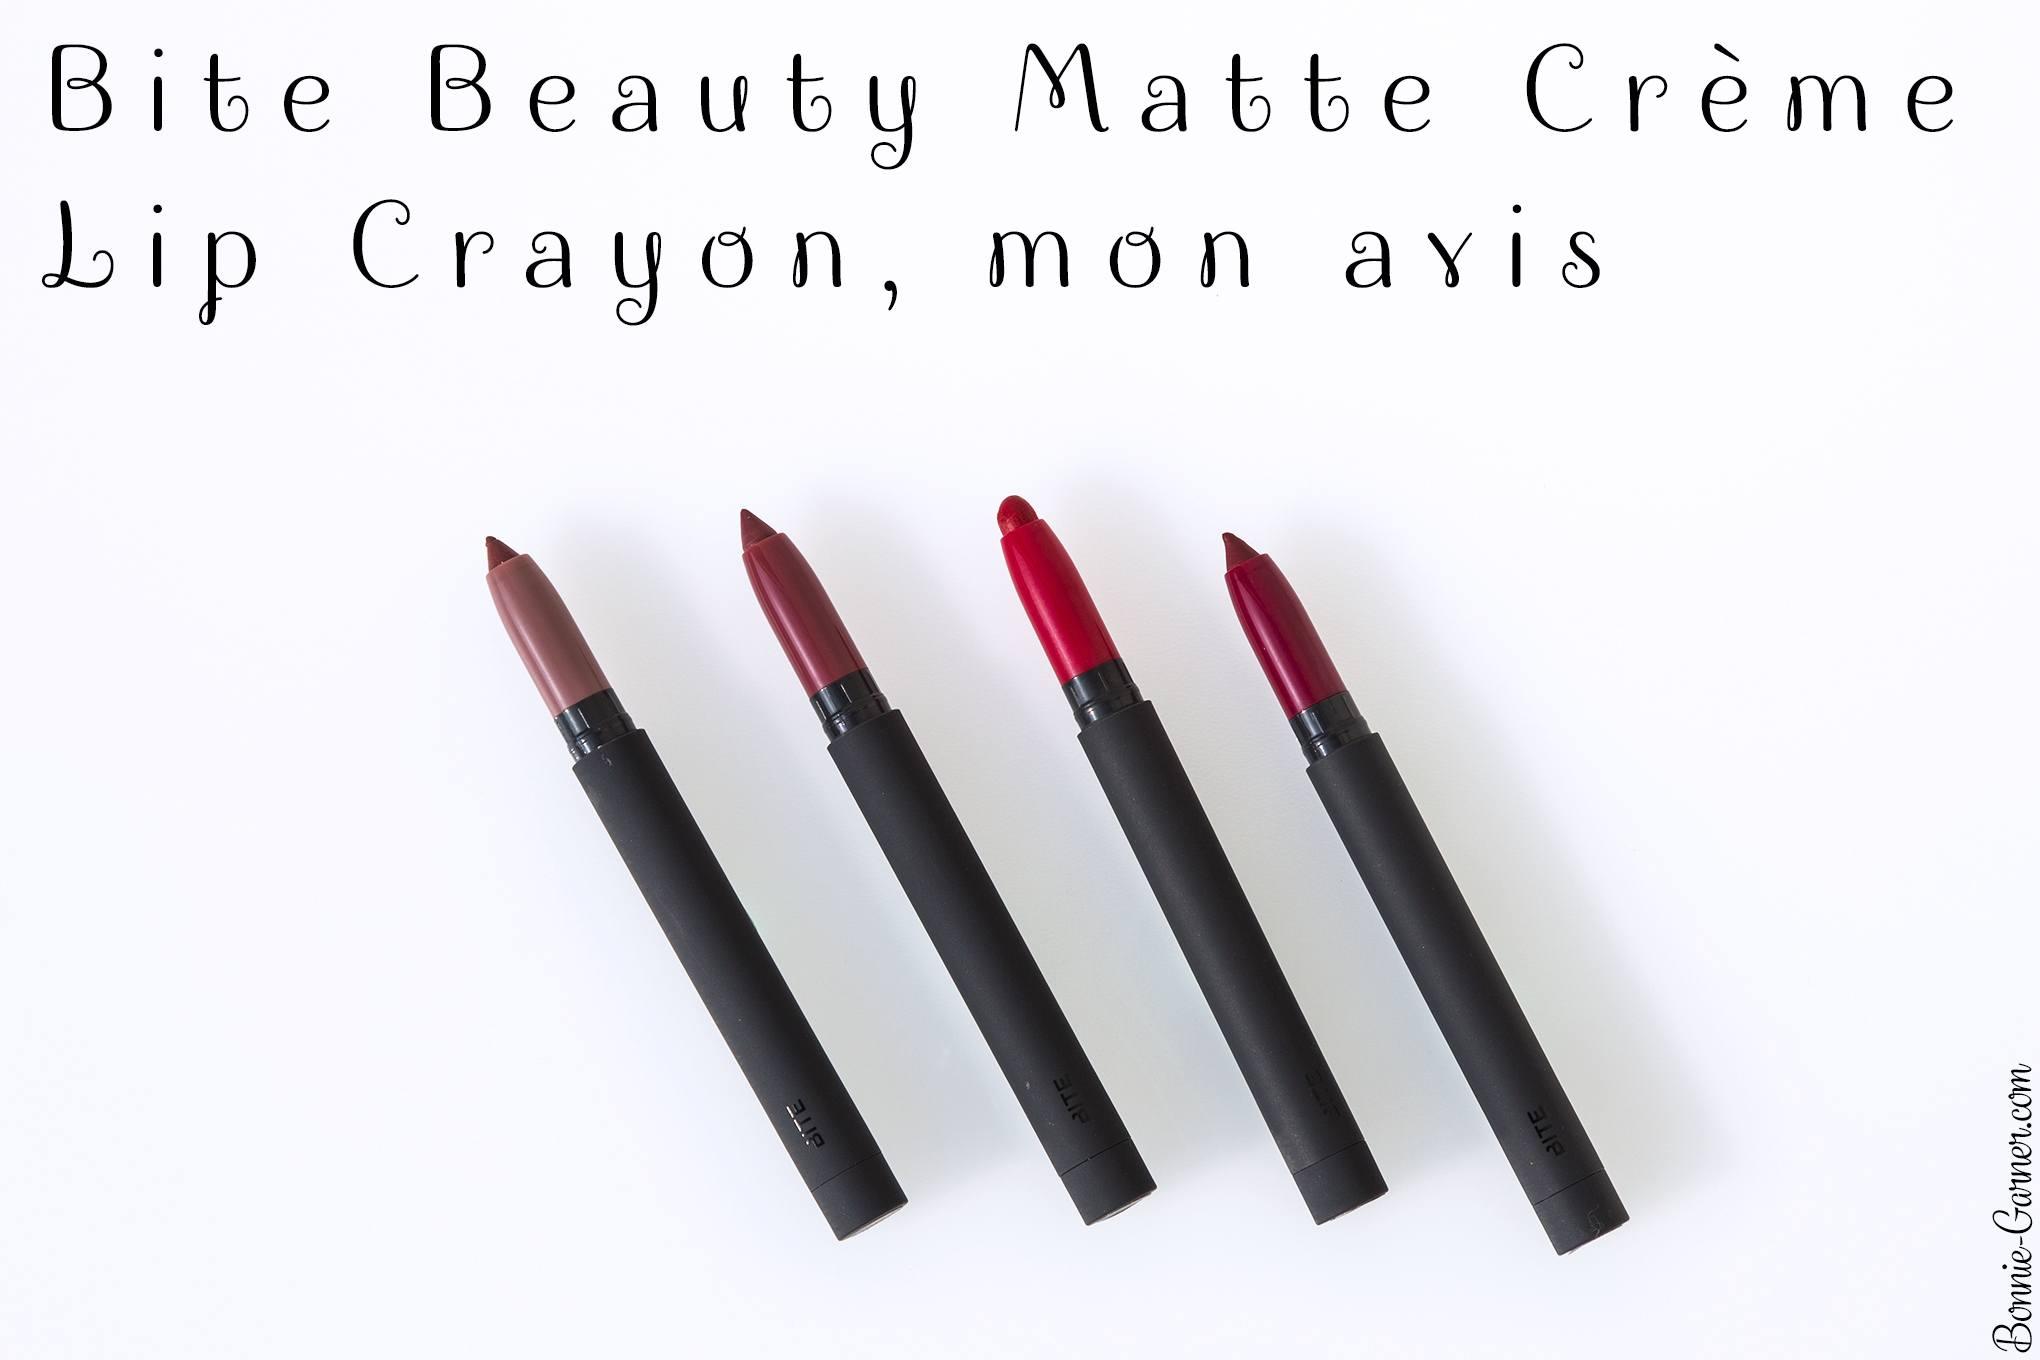 Bite Beauty Matte Crème Lip Crayon, mon avis